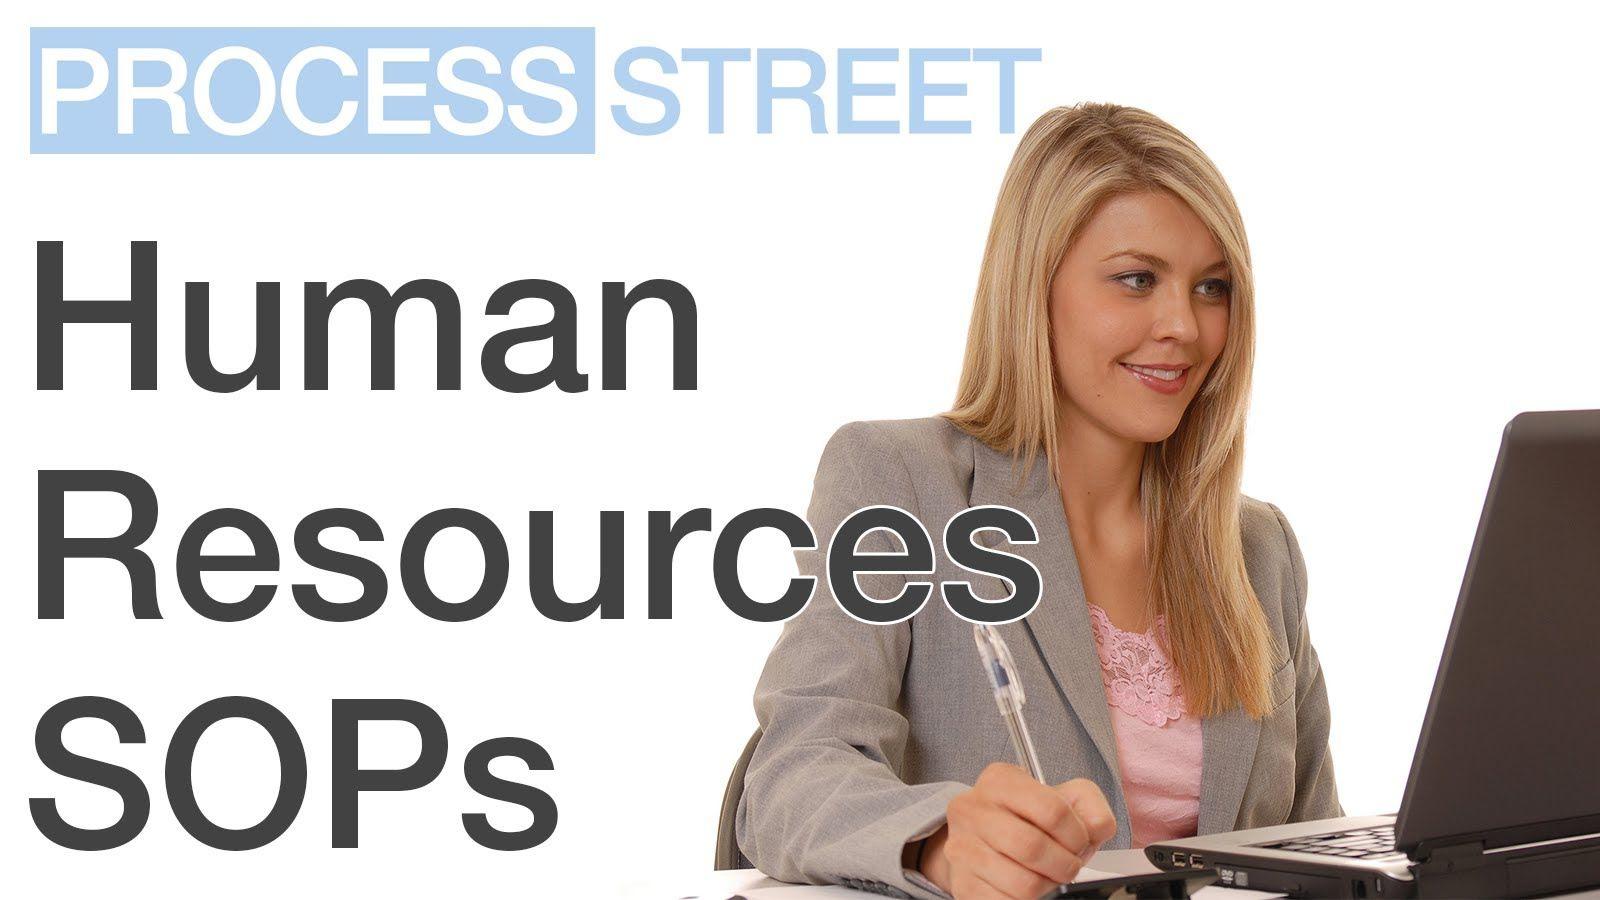 Human Resources Standard Operating Procedures | HR | SOPs | Process